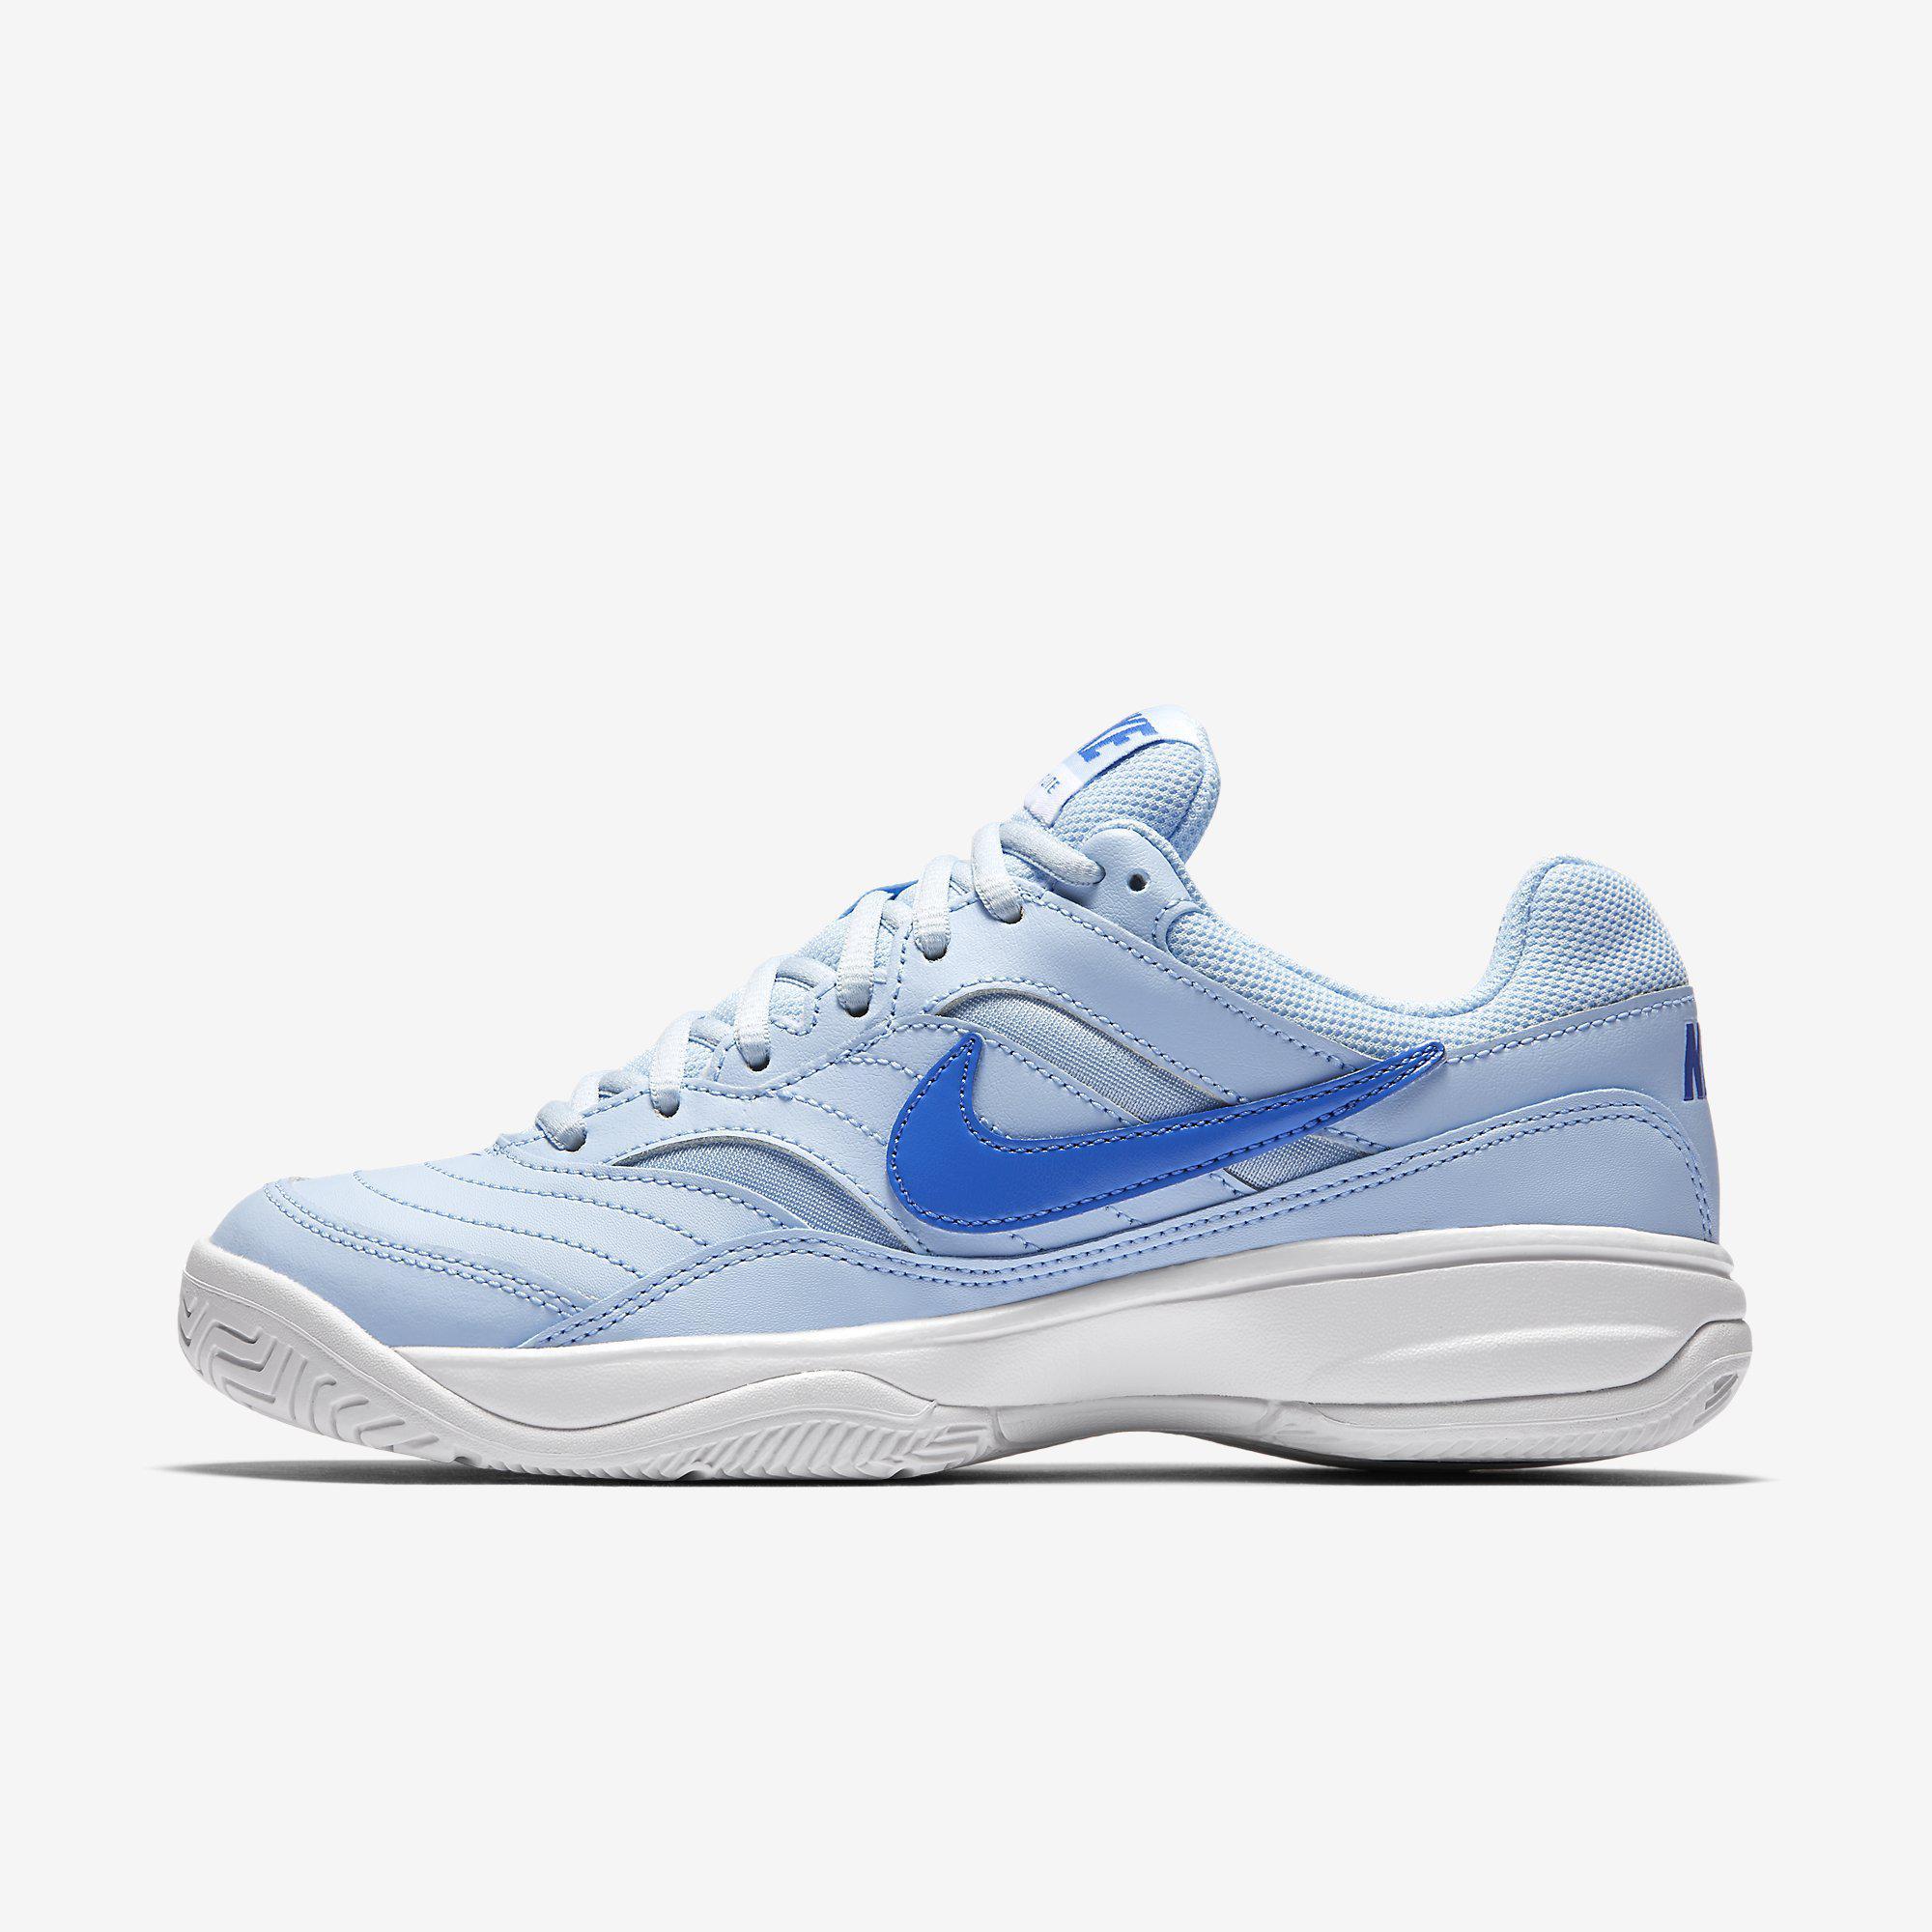 Nike tennis shoes women white